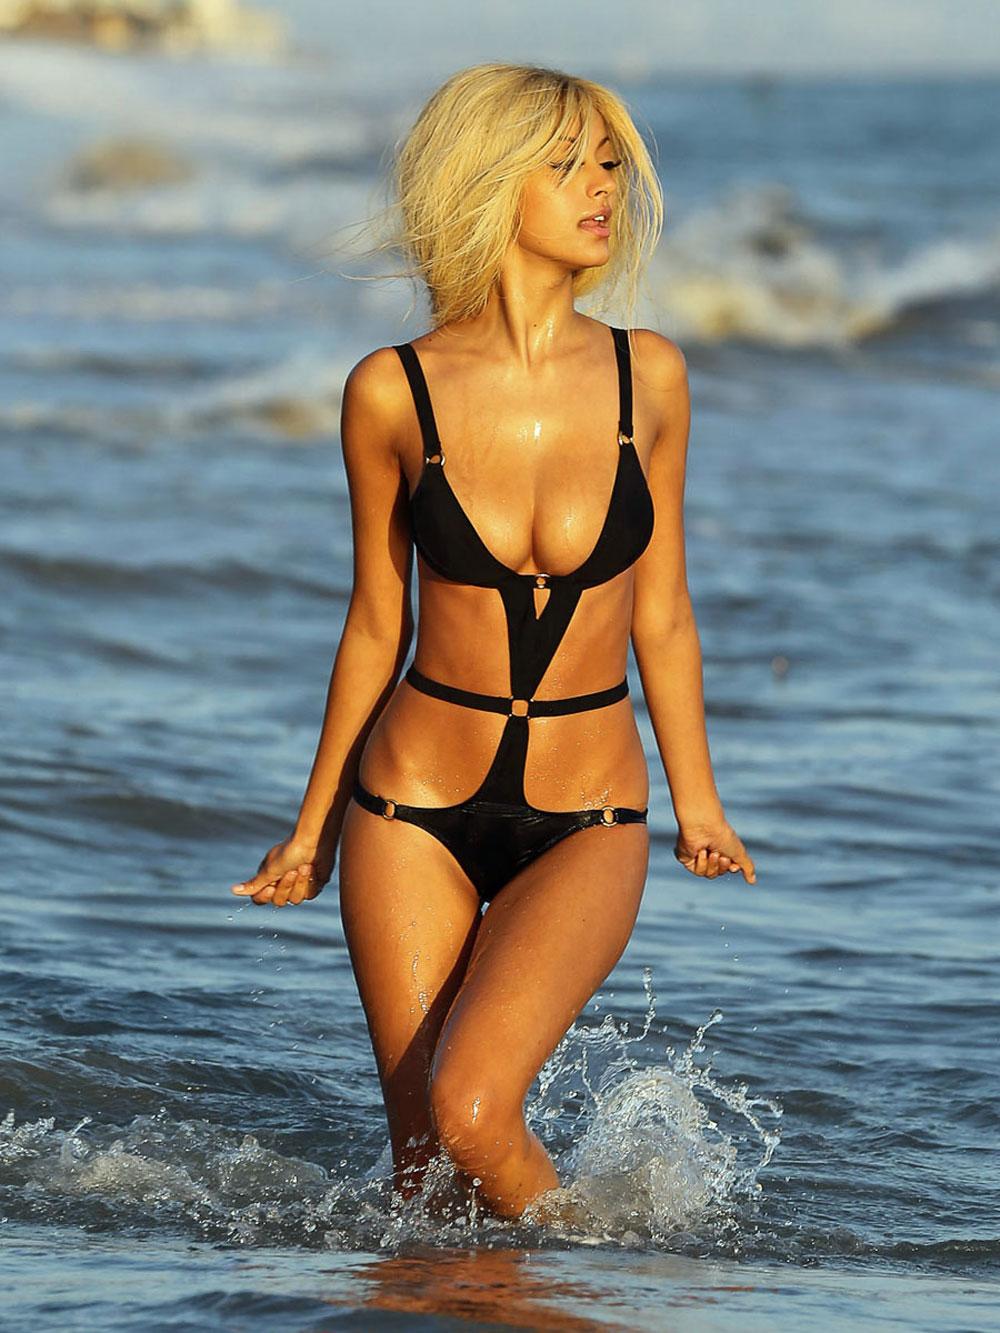 Beach zahia dehar Rebecca Zlotowski's